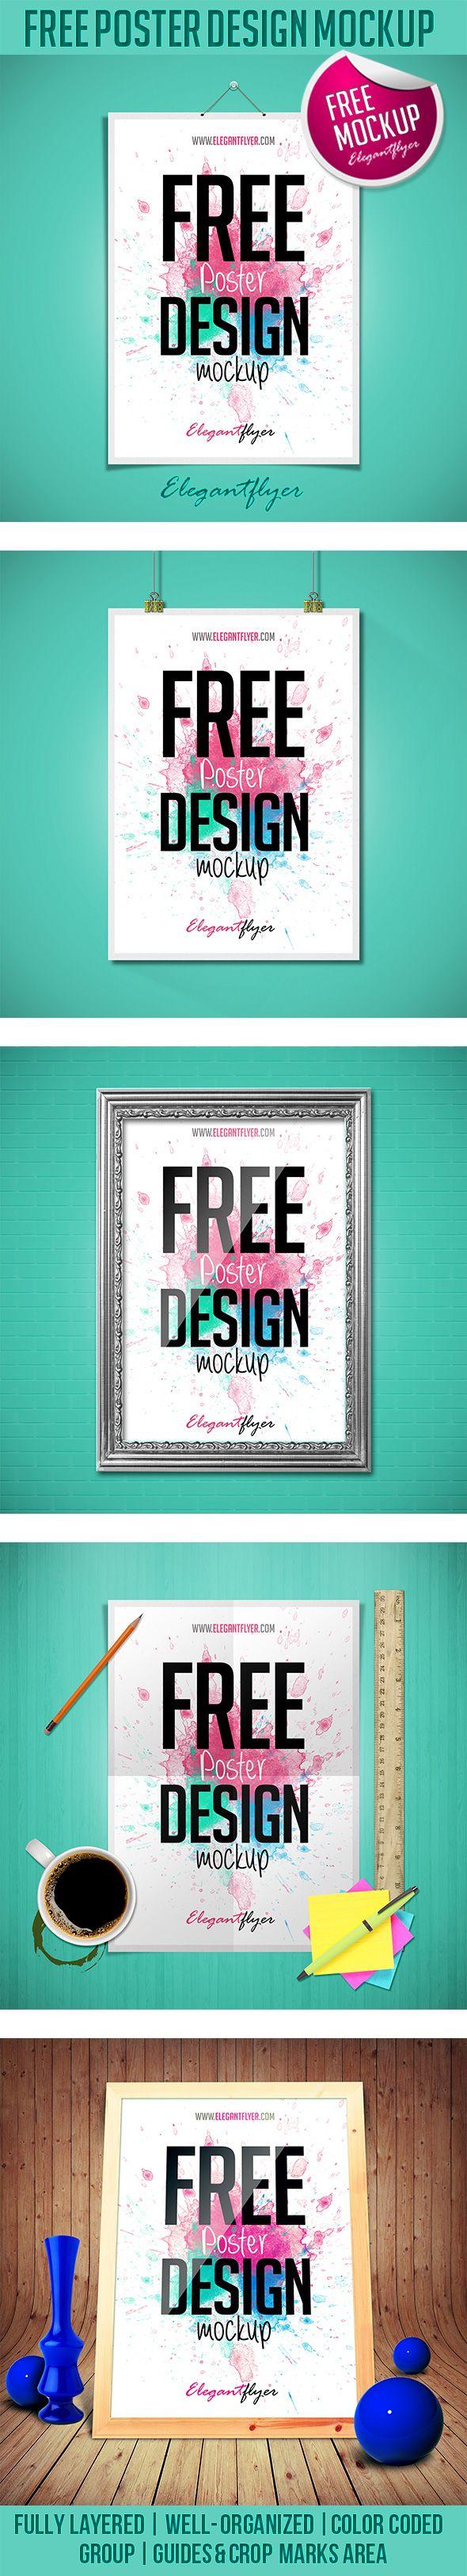 Poster design for free - Free Poster Design Mockup Https Www Elegantflyer Com Free